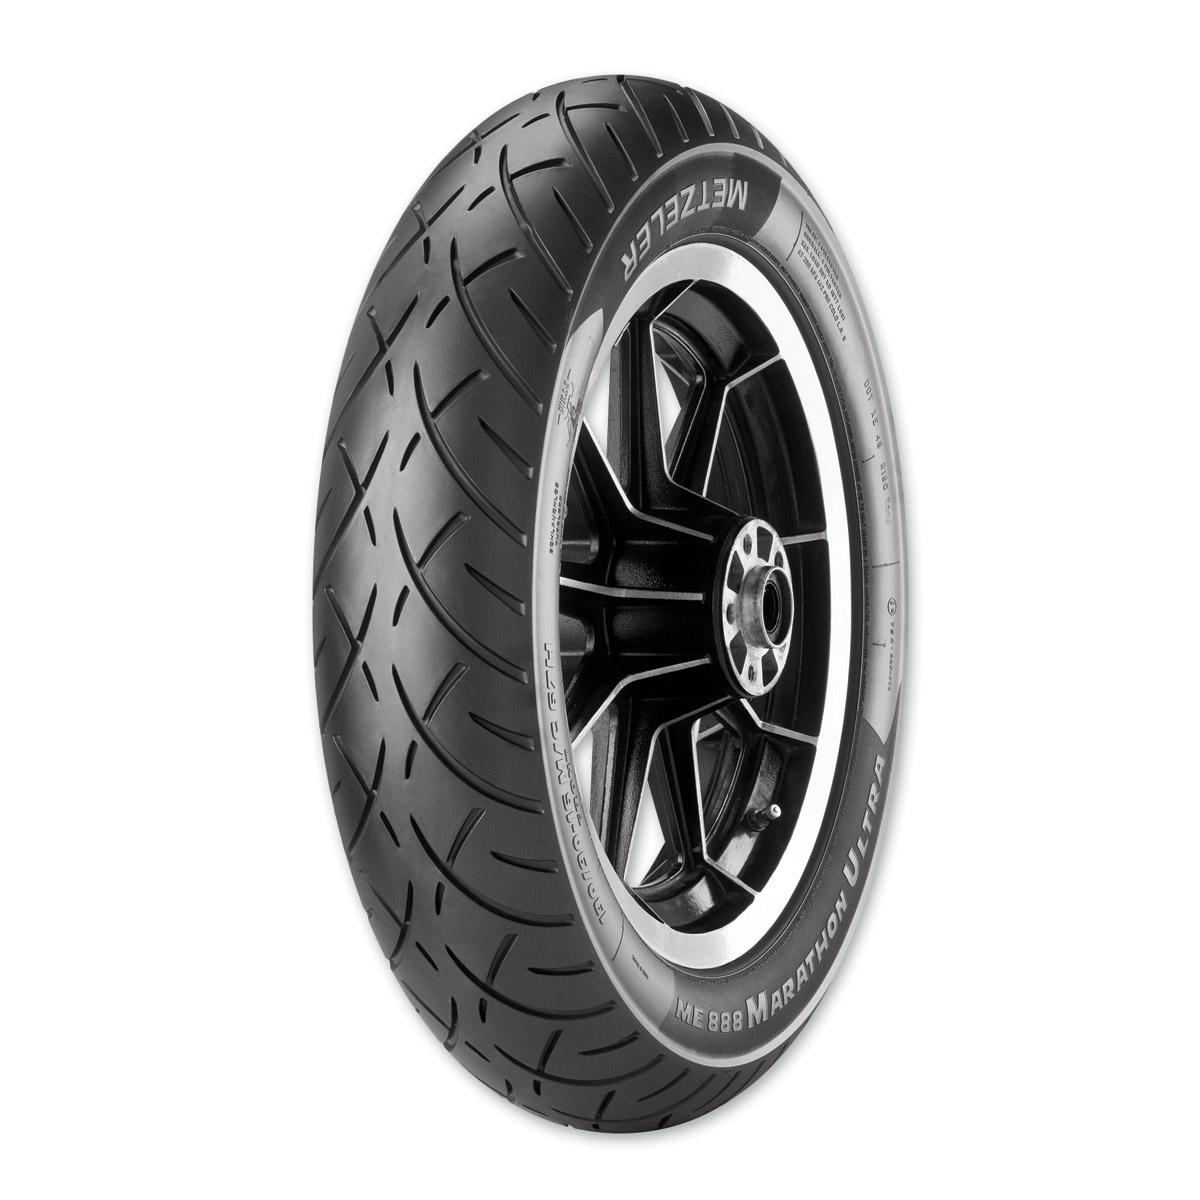 Metzeler ME888 Marathon Ultra 130/70B18 Front Tire